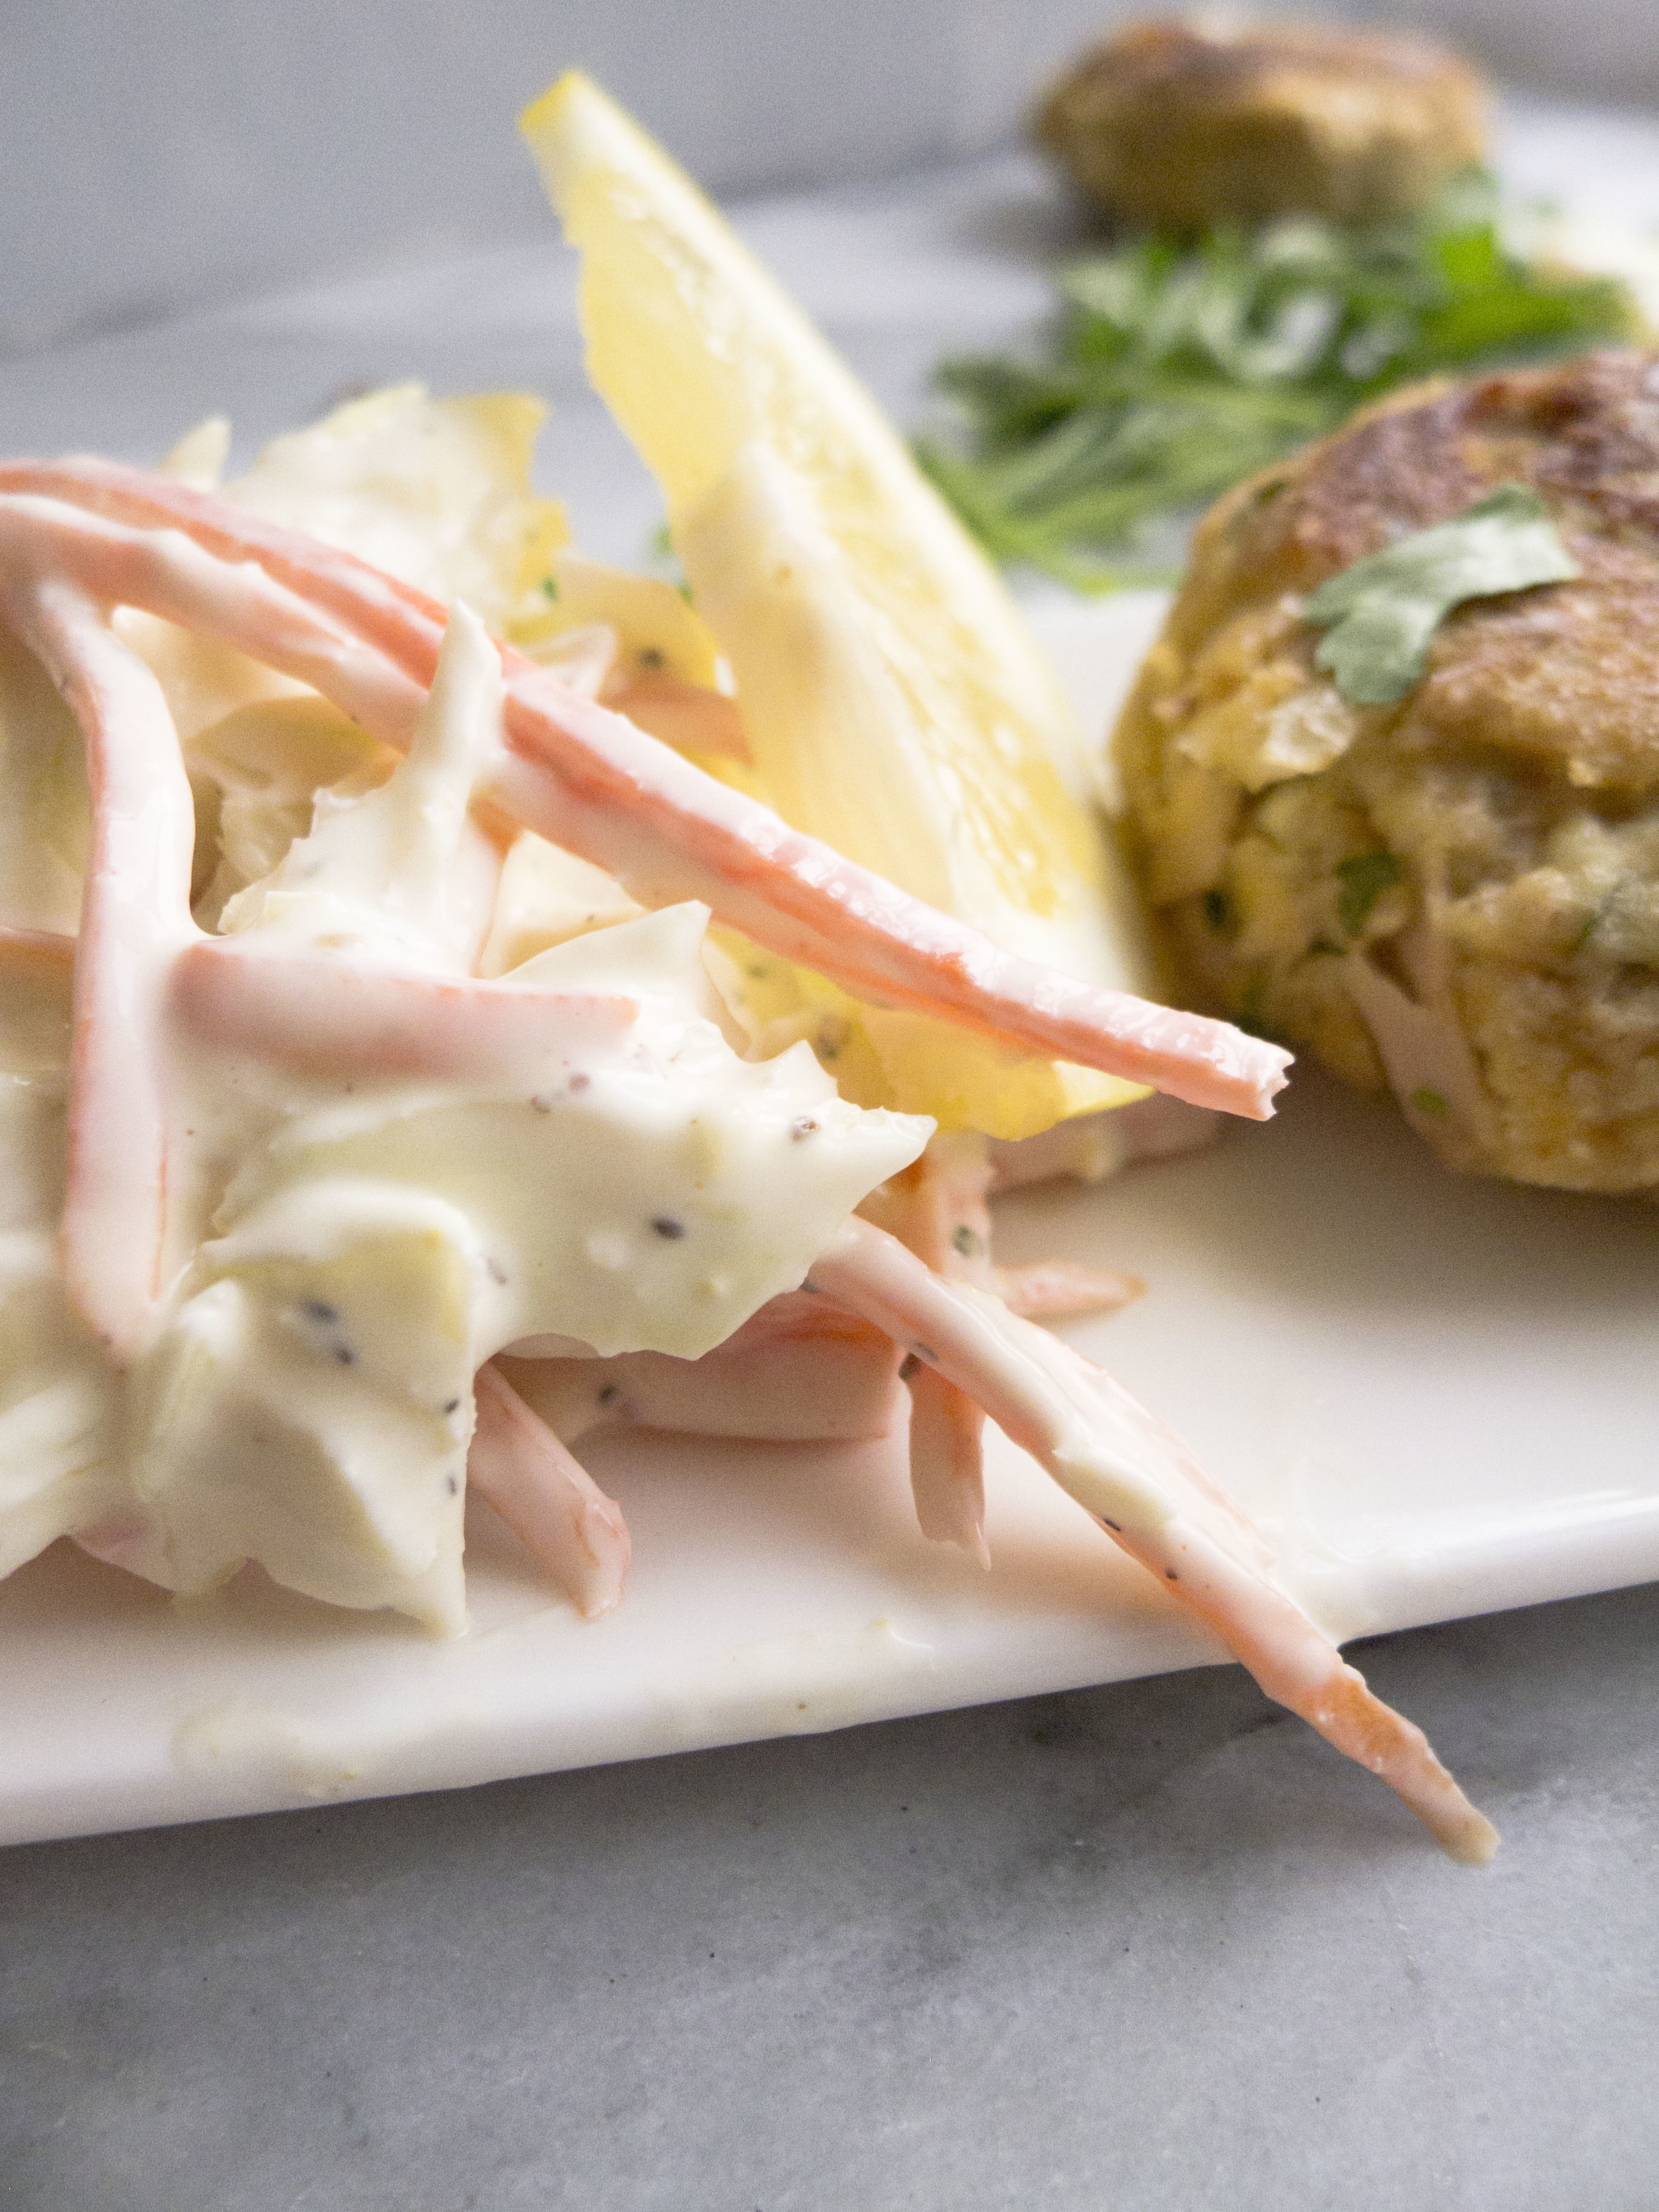 Healthy Tuna Patties with Greek Yogurt Coleslaw